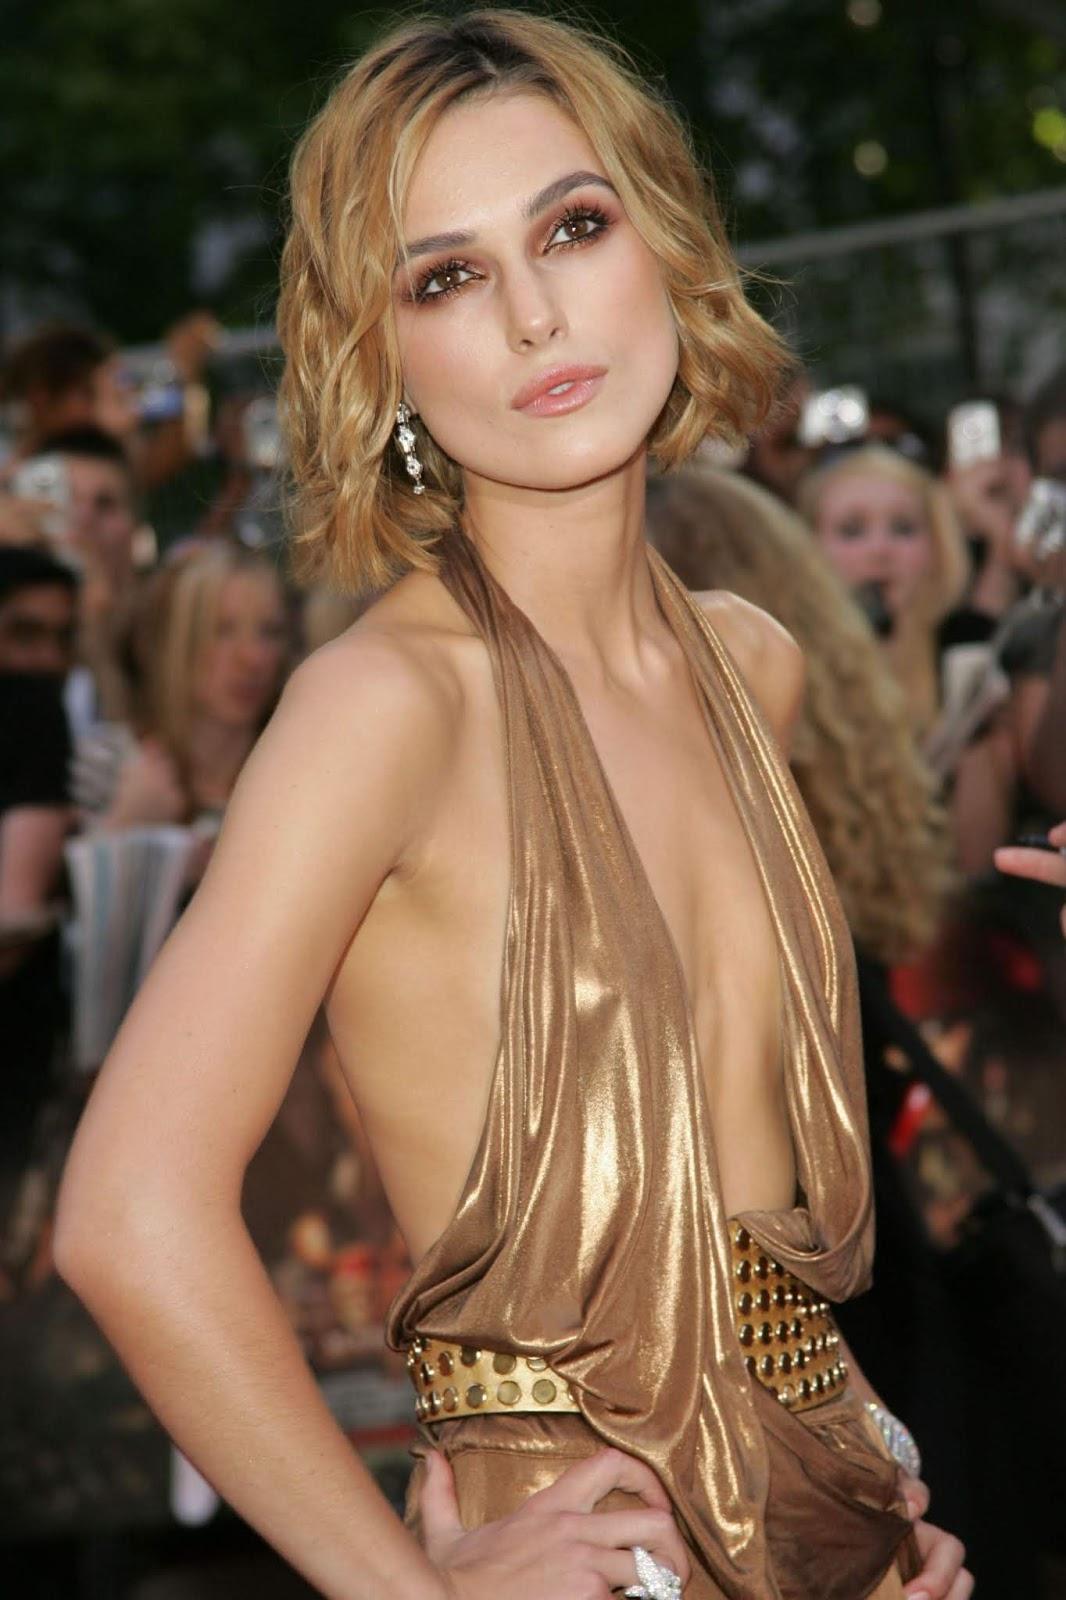 Sexiest Female Celebrities